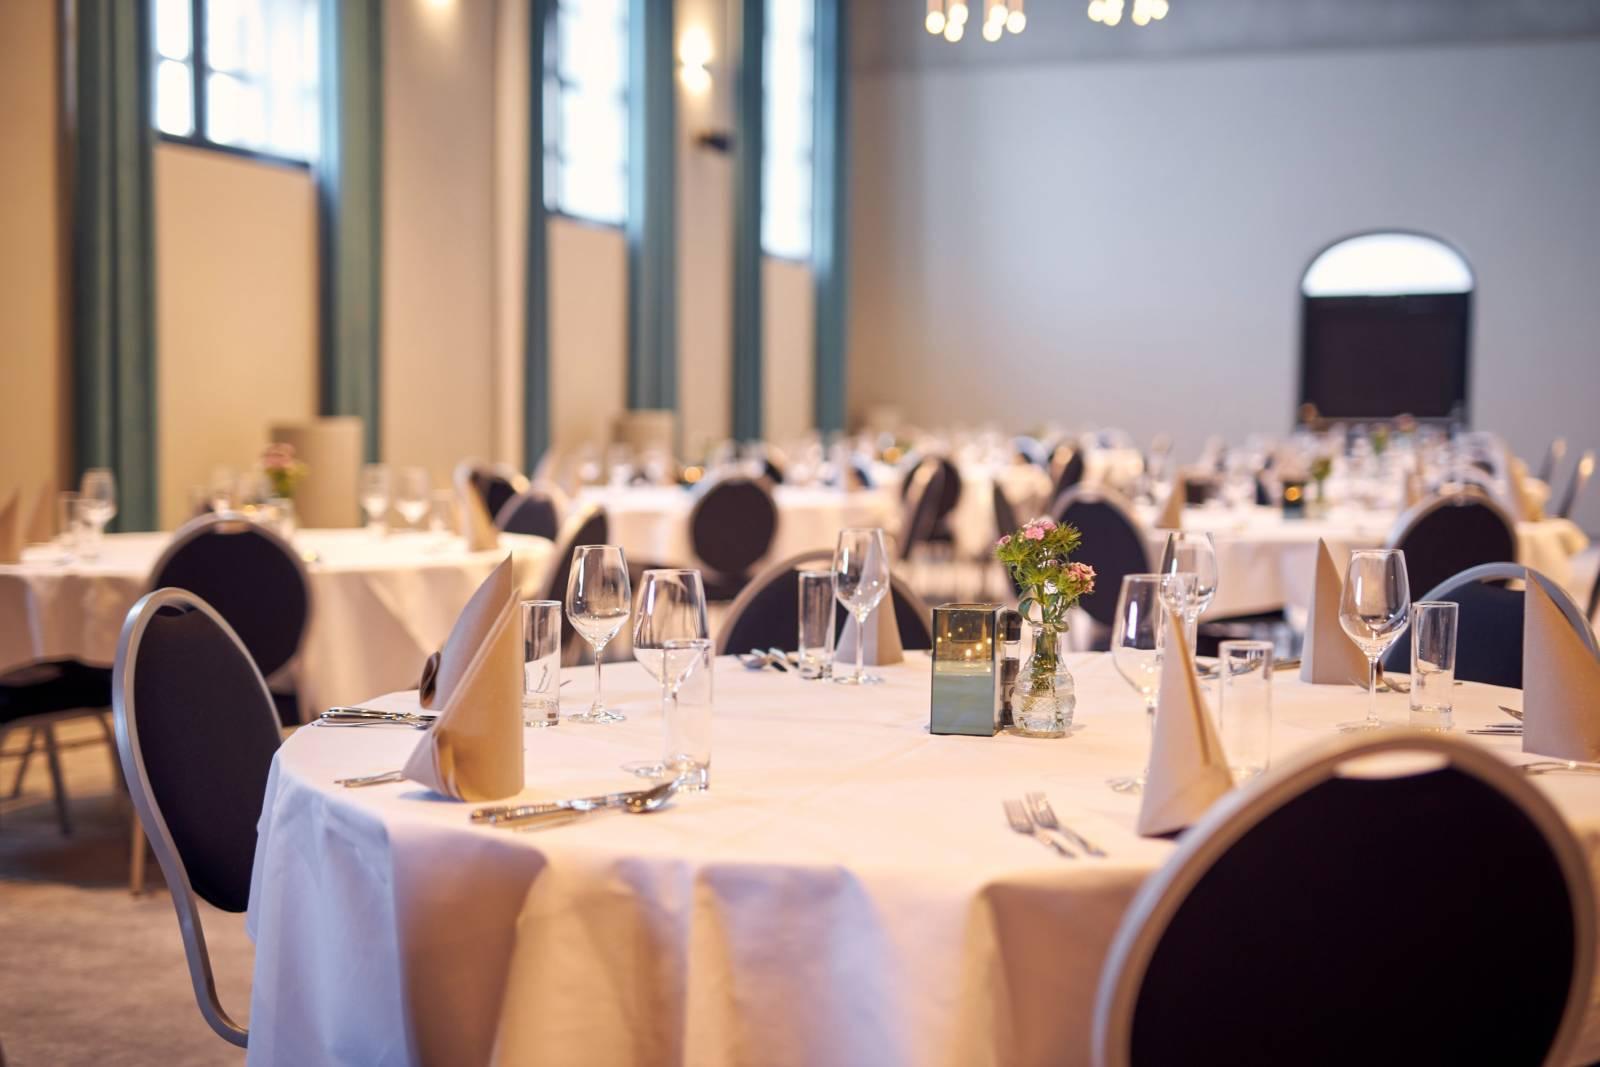 Feestal - Van der Valk hotel Mechelen - House of Weddings (14)